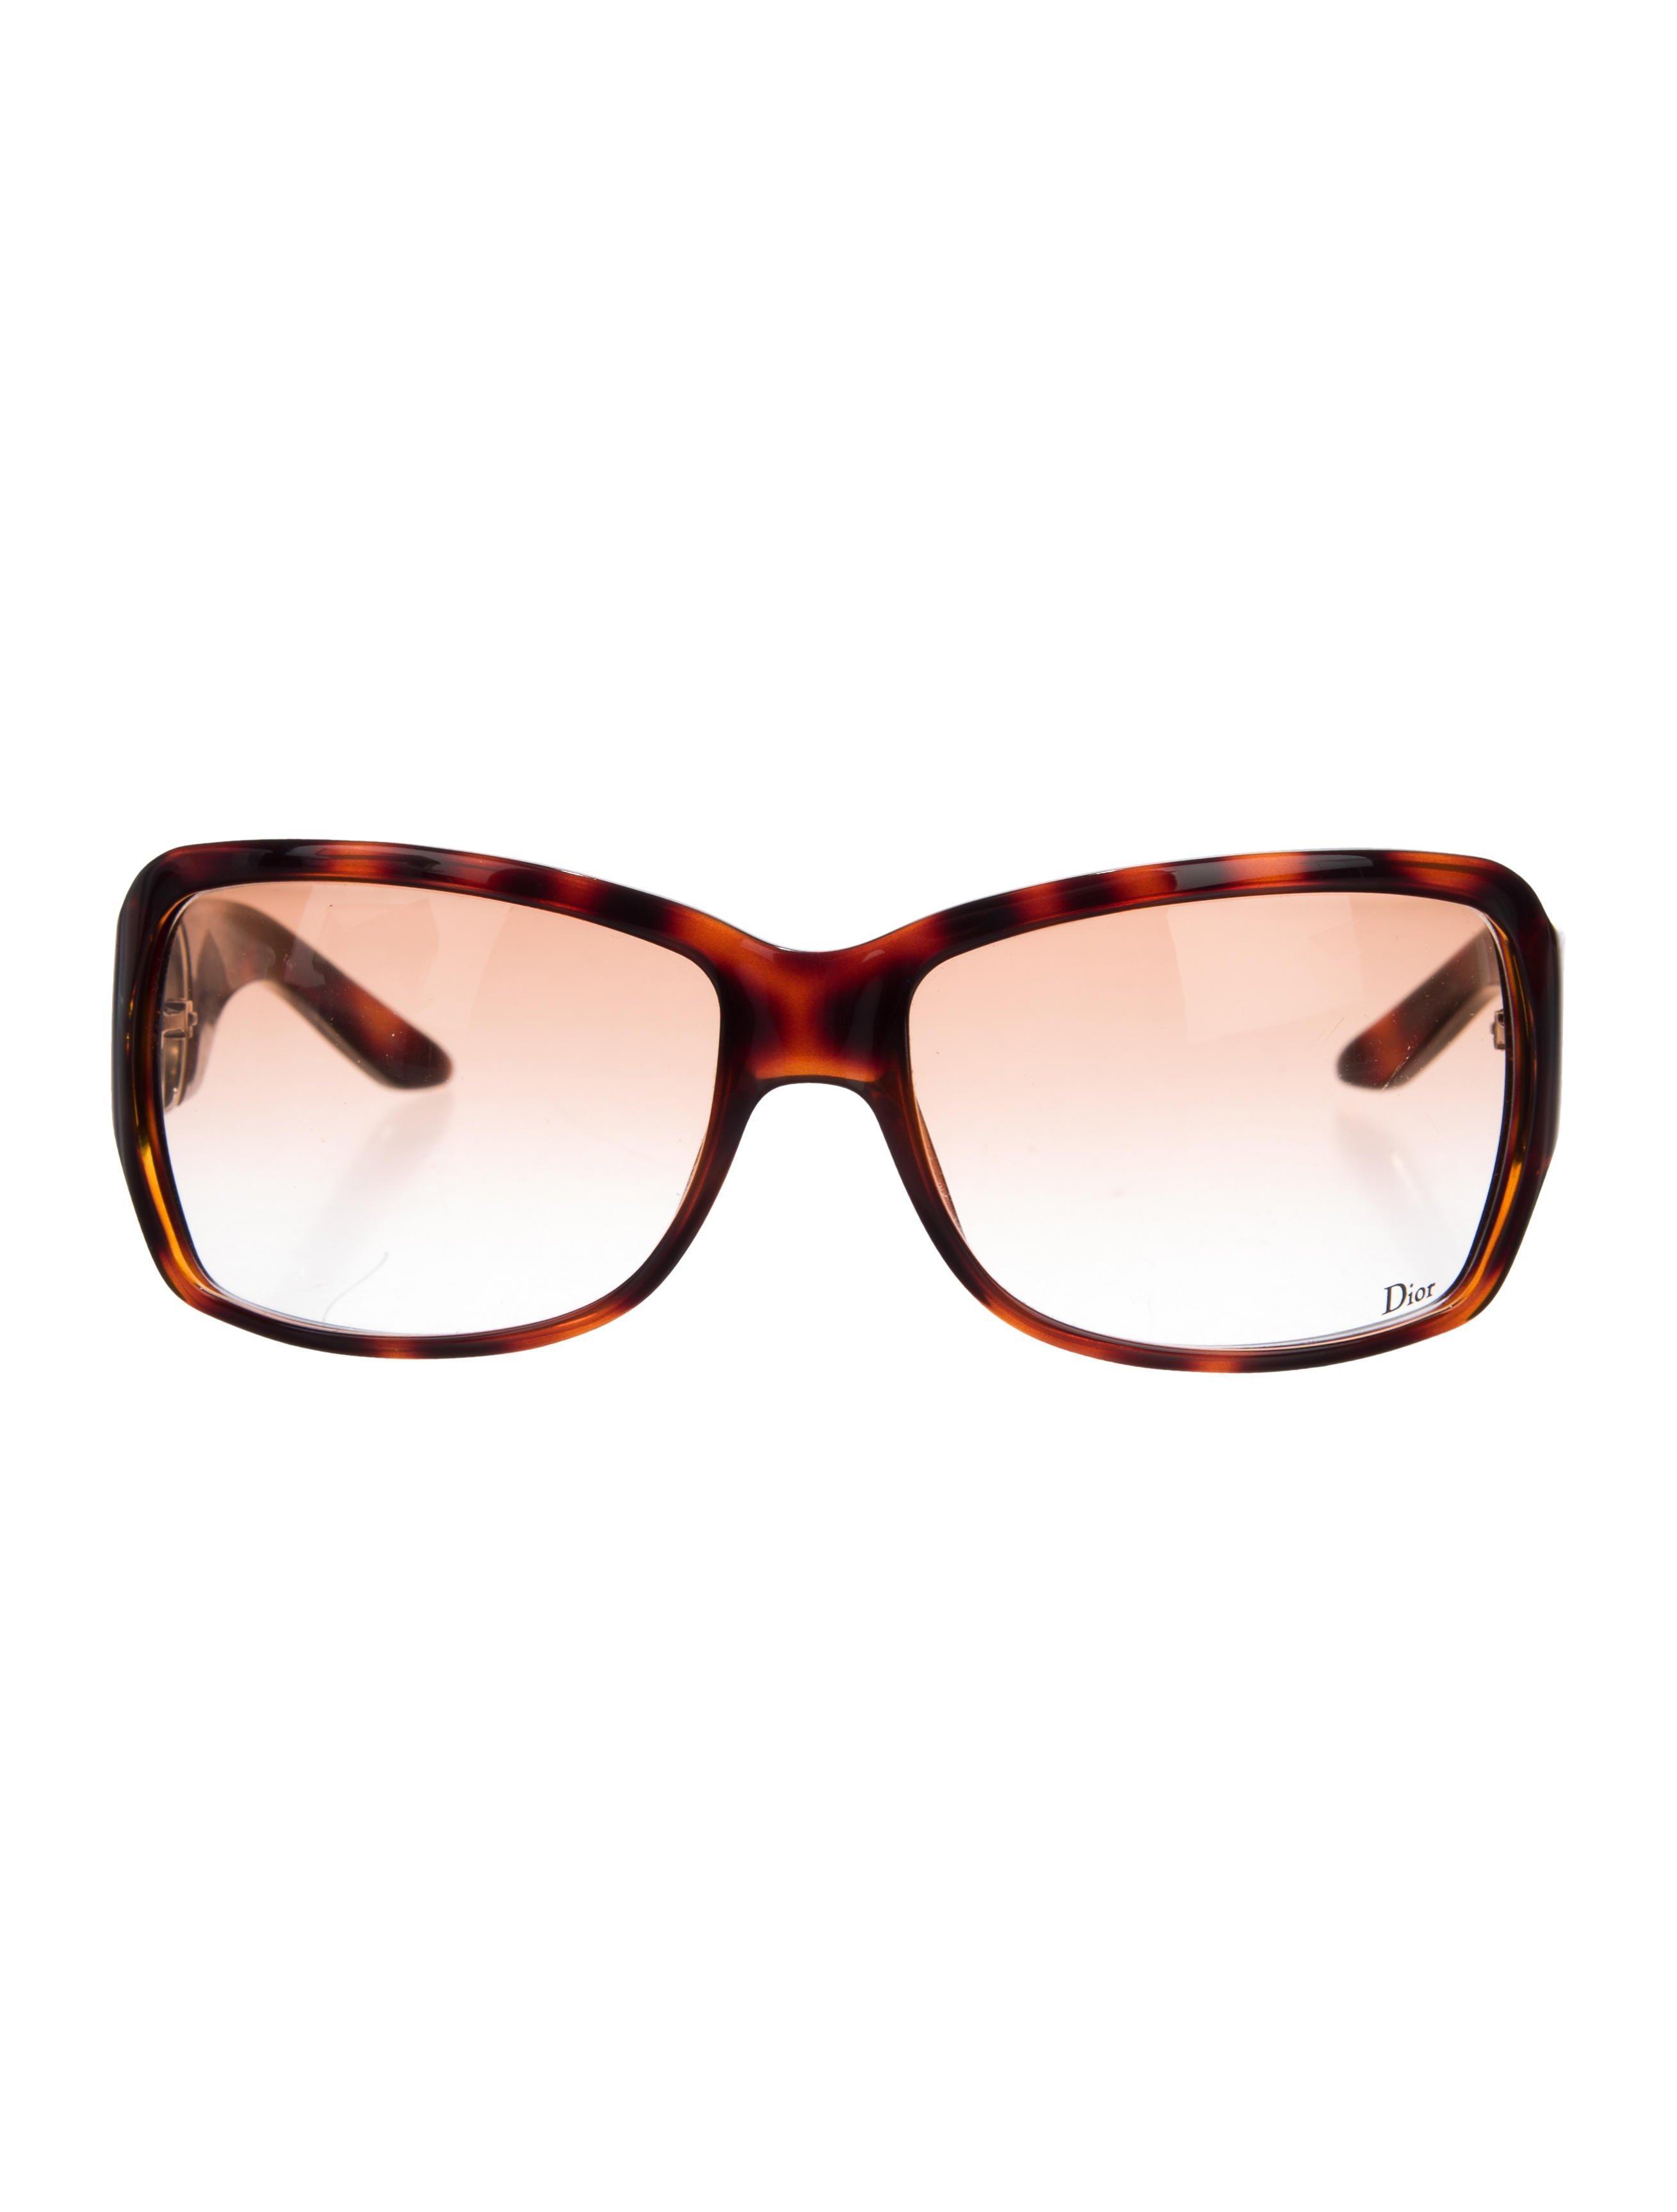 73a8d6988e4 Lyst - Dior Day 1 Sunglasses Brown in Metallic